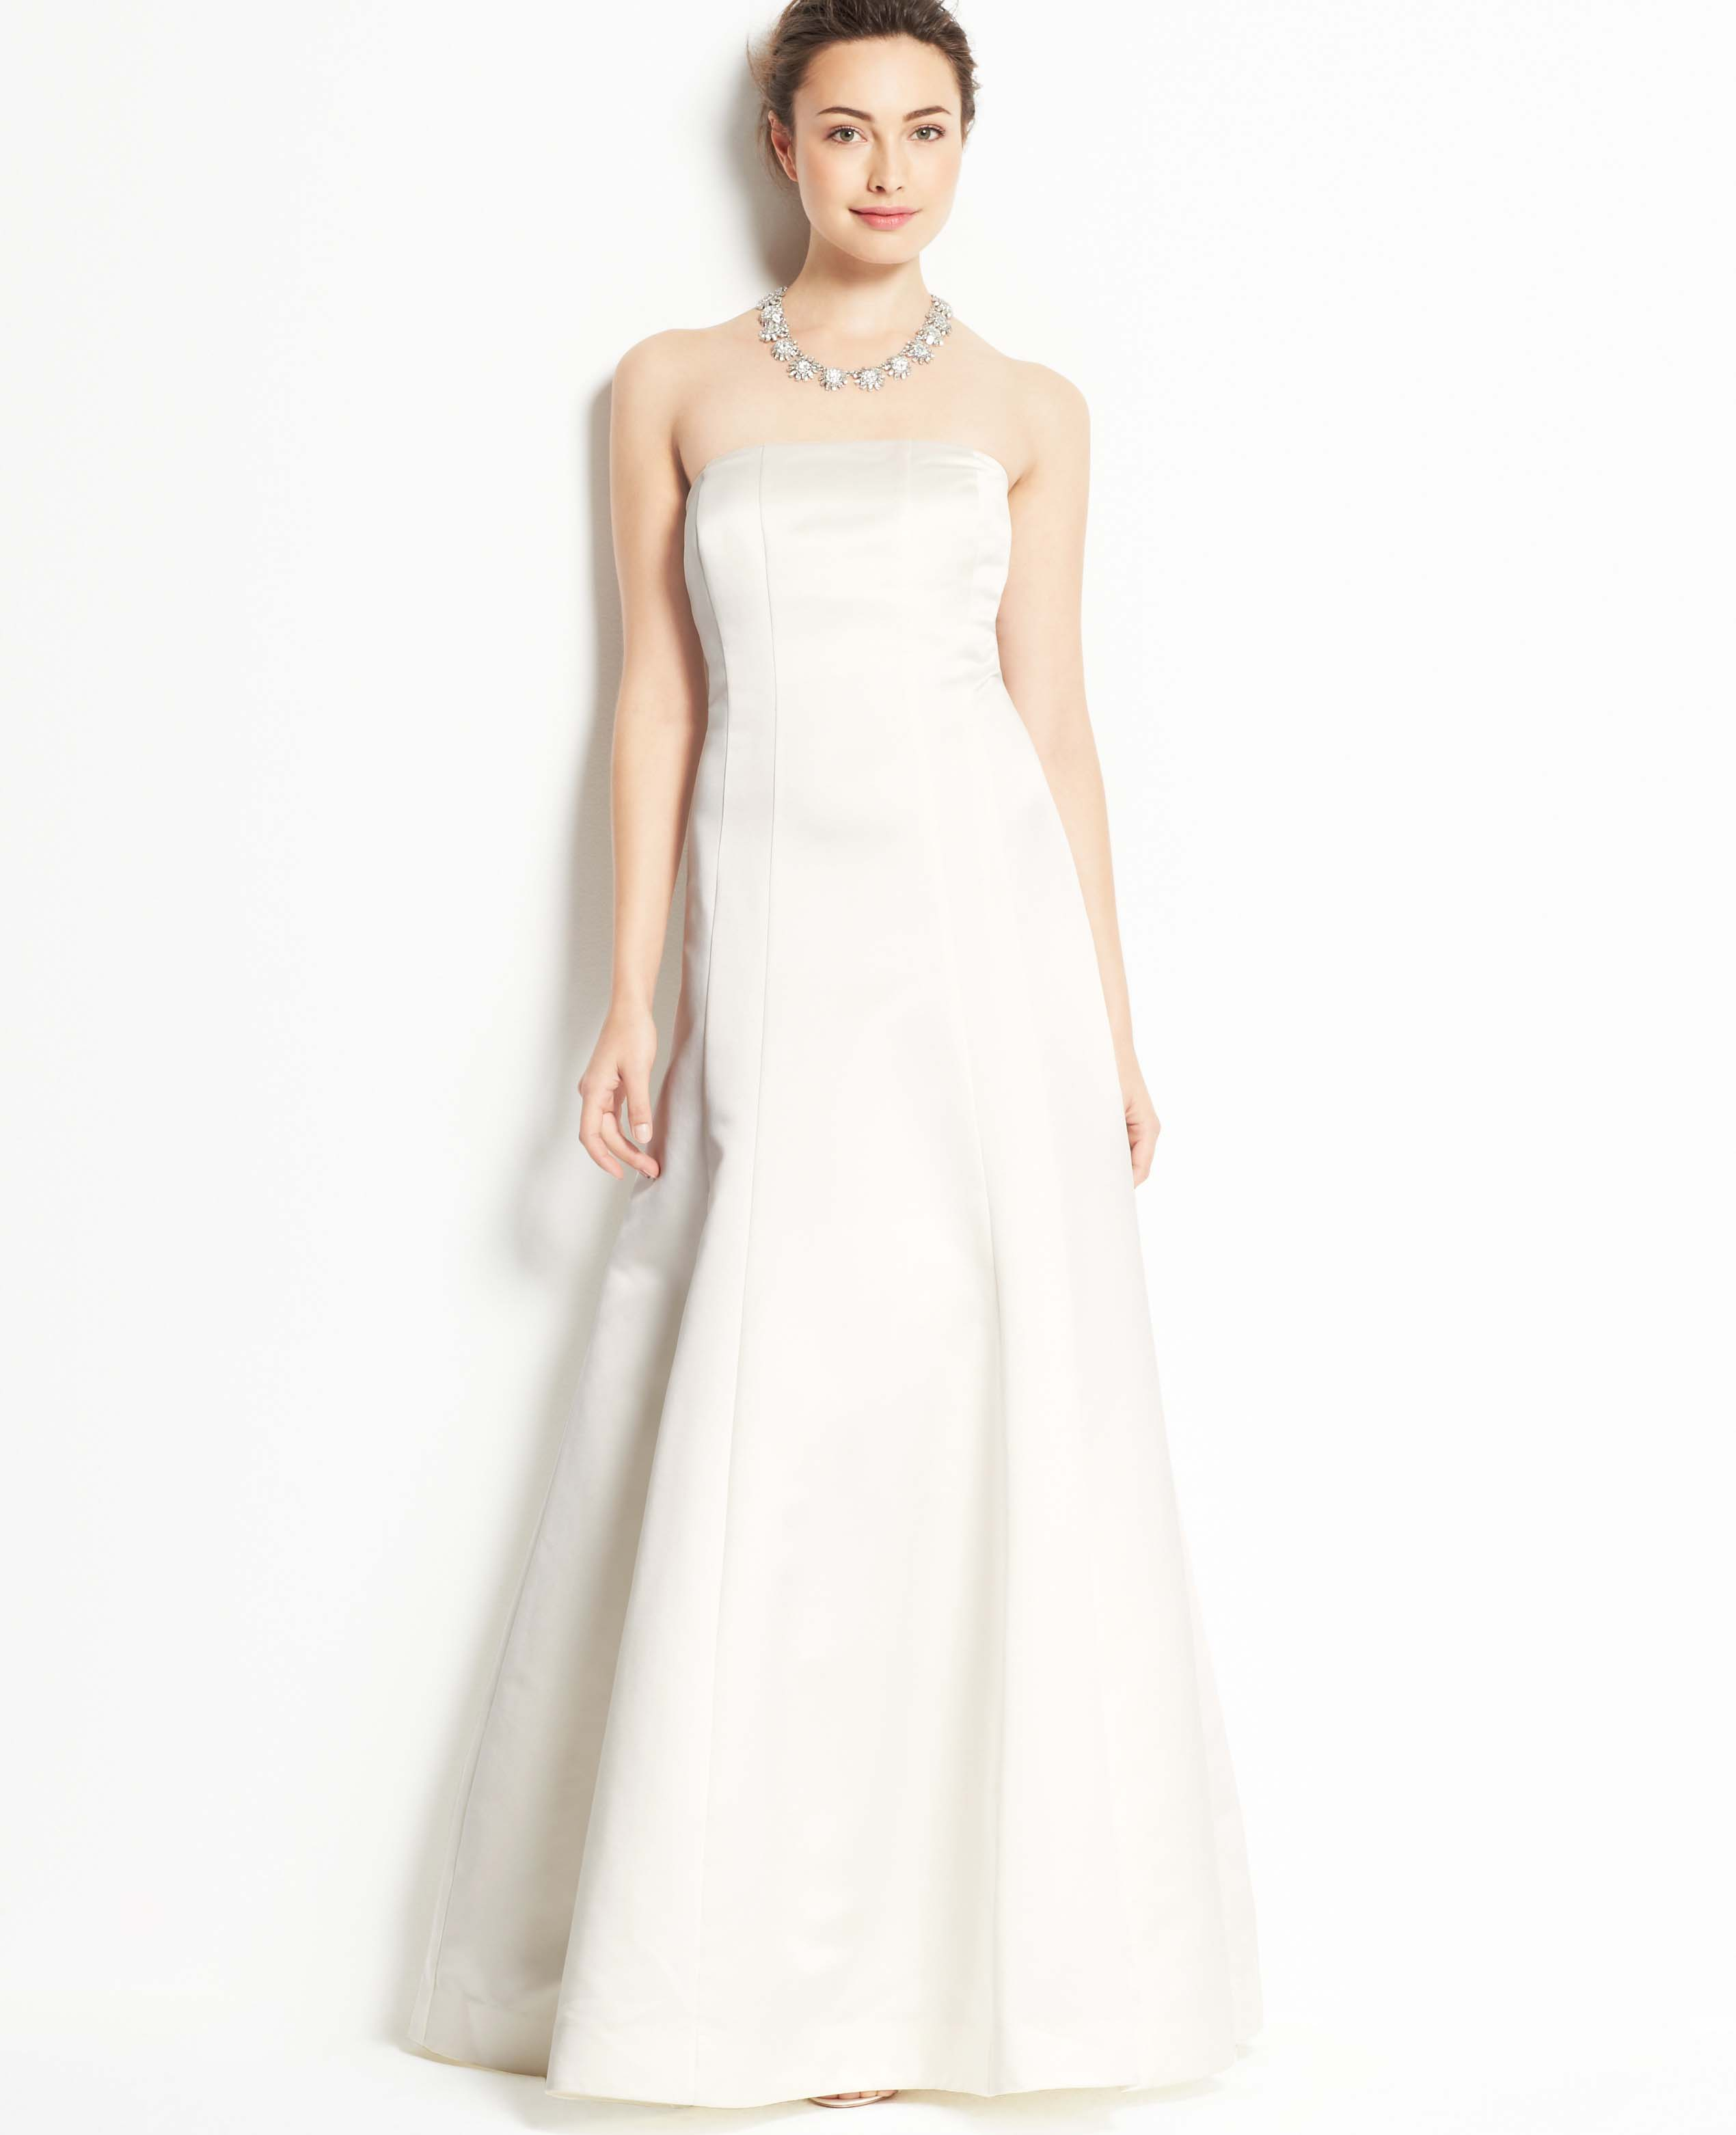 Lyst ann taylor duchess satin strapless wedding dress in white gallery ombrellifo Images